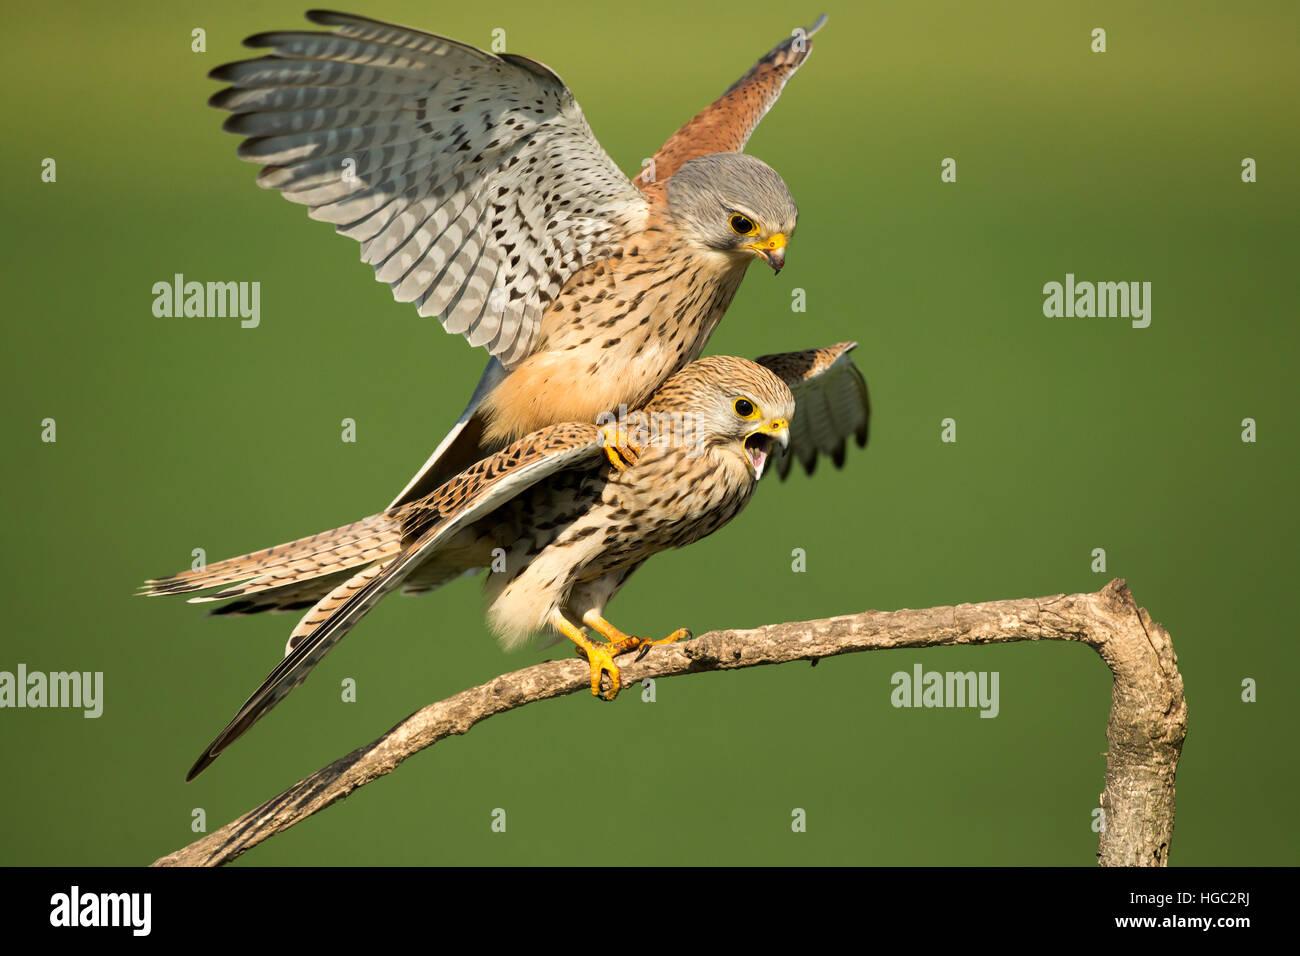 Kestrels (Falco tinnunculus) mating - Stock Image